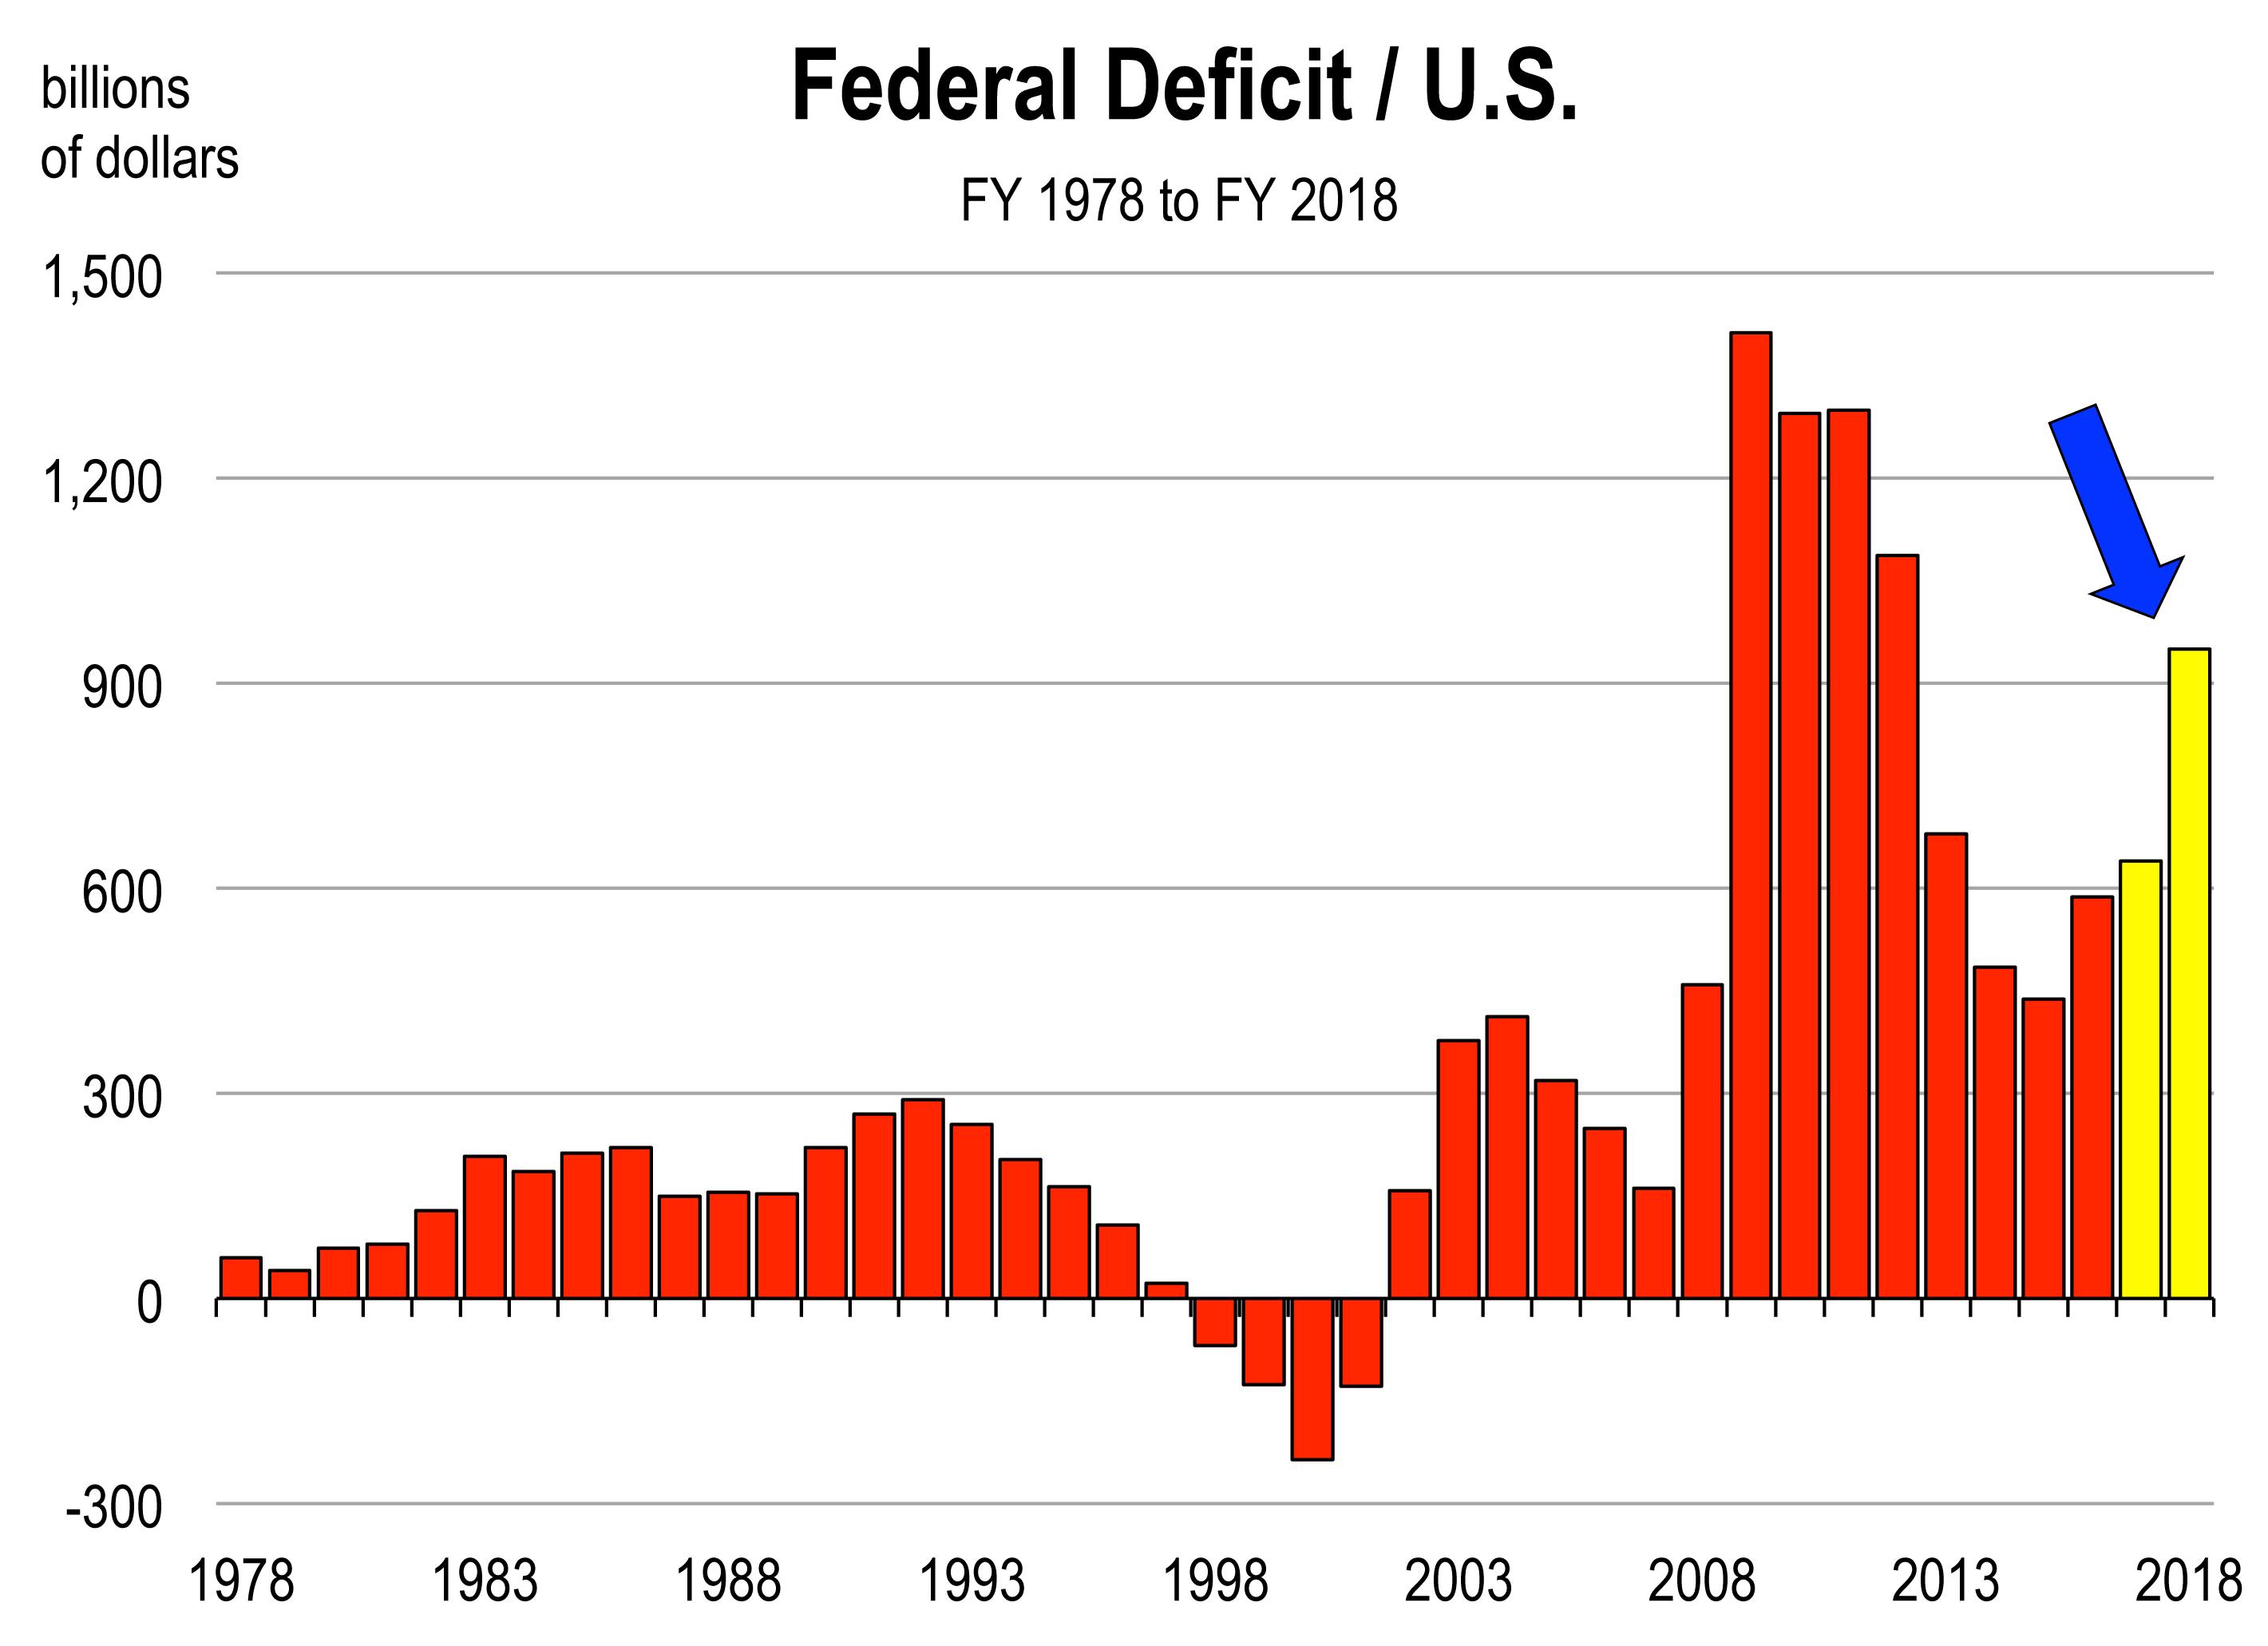 Federal Deficit.xlsx